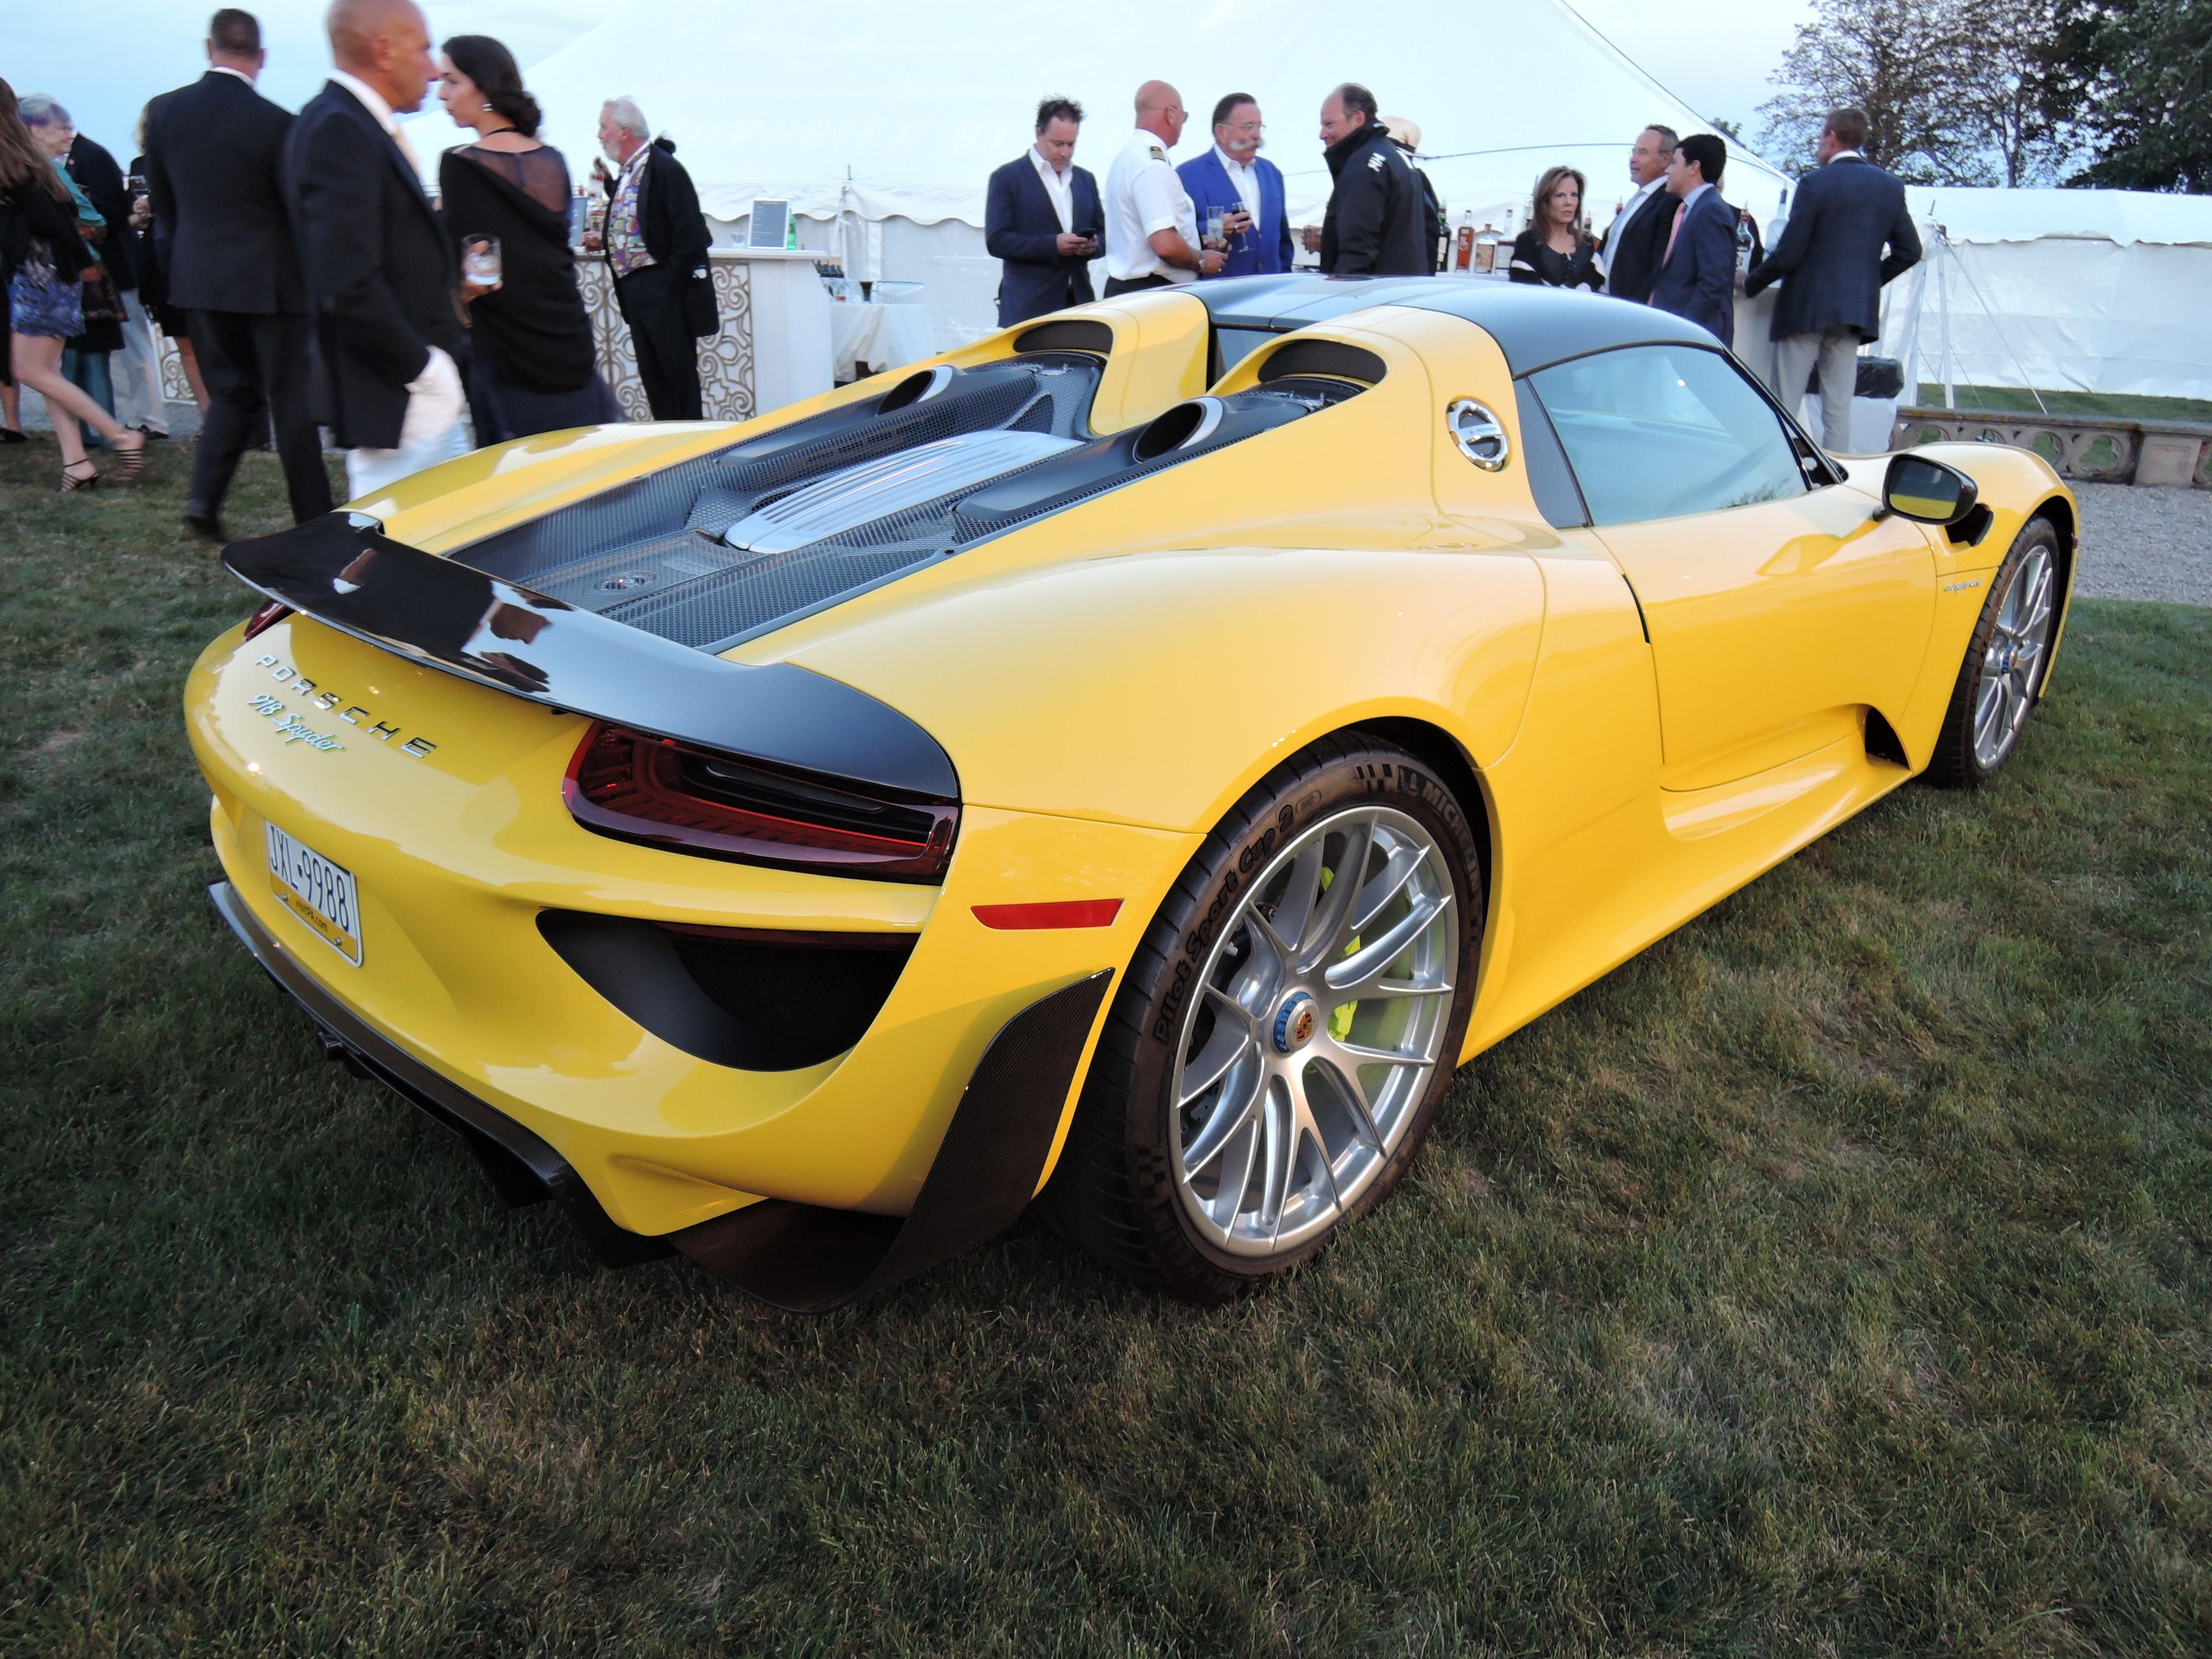 yellow Porsche 918 Spyder - Audrain Auto Museum Gala 2017